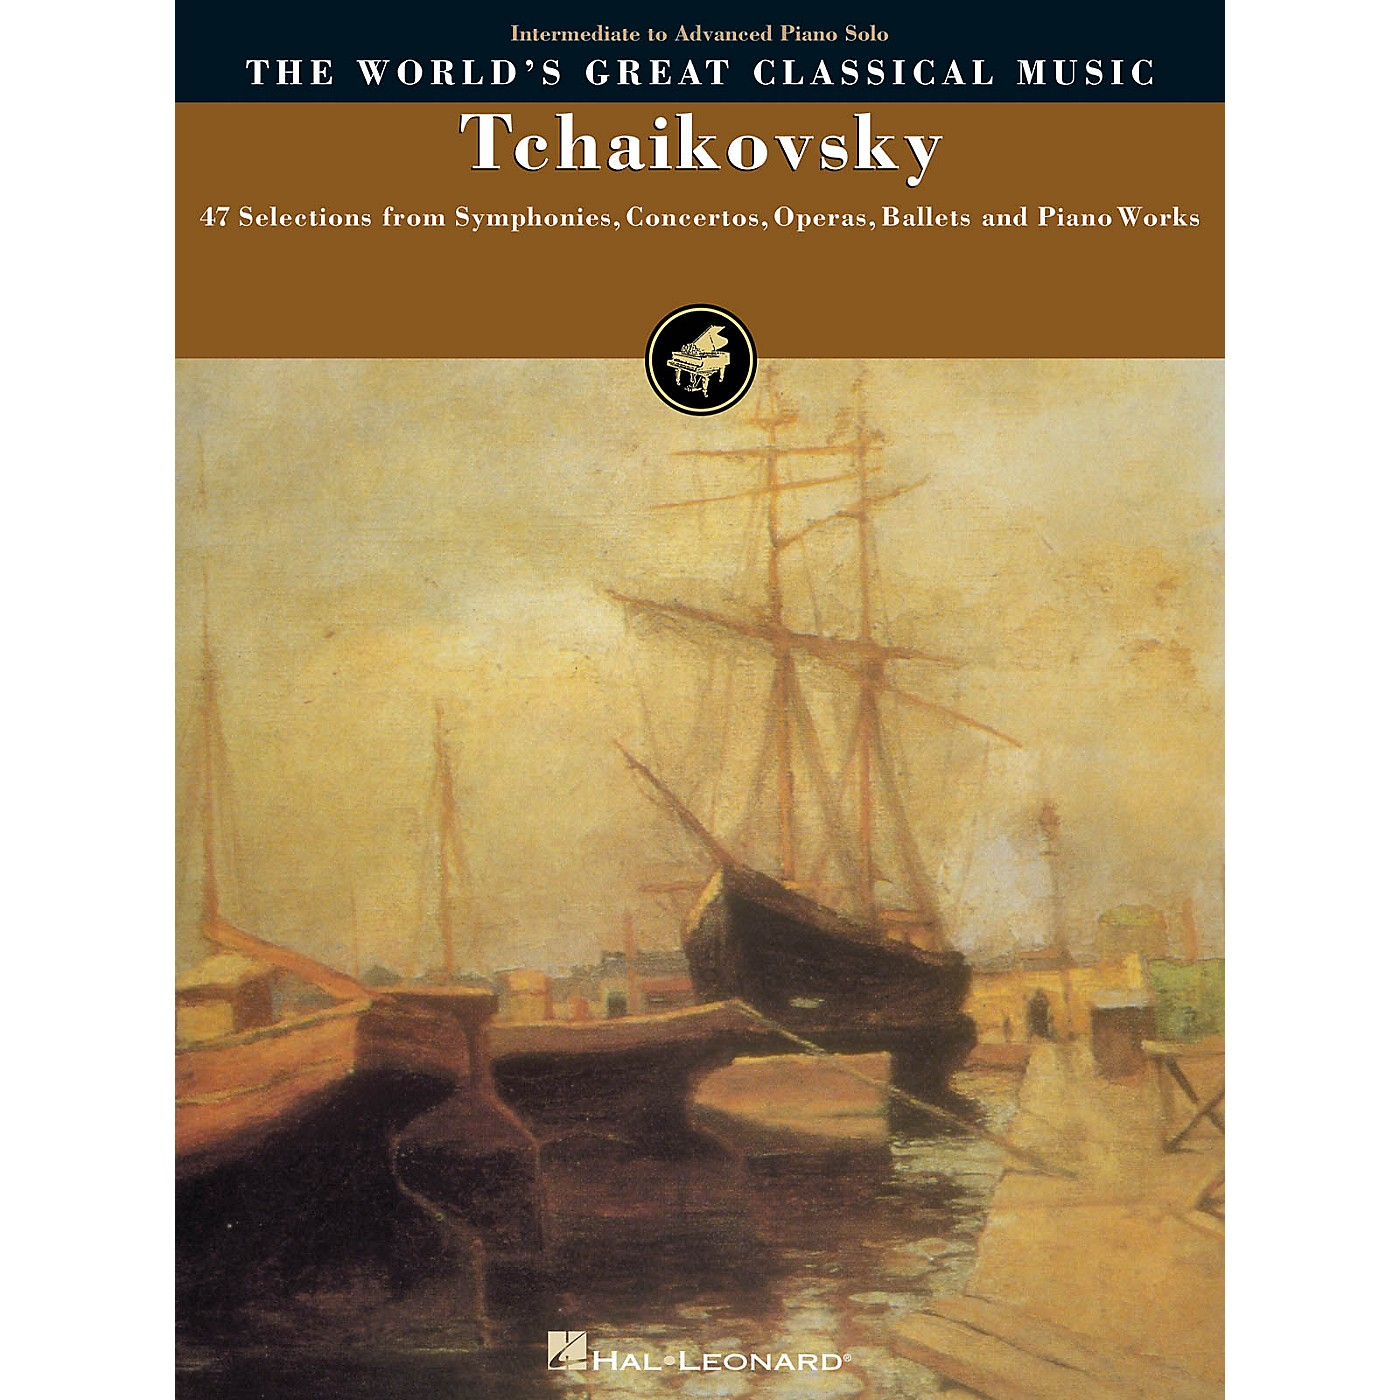 Hal Leonard Tchaikovsky World's Greatest Classical Music Series (Intermediate) thumbnail